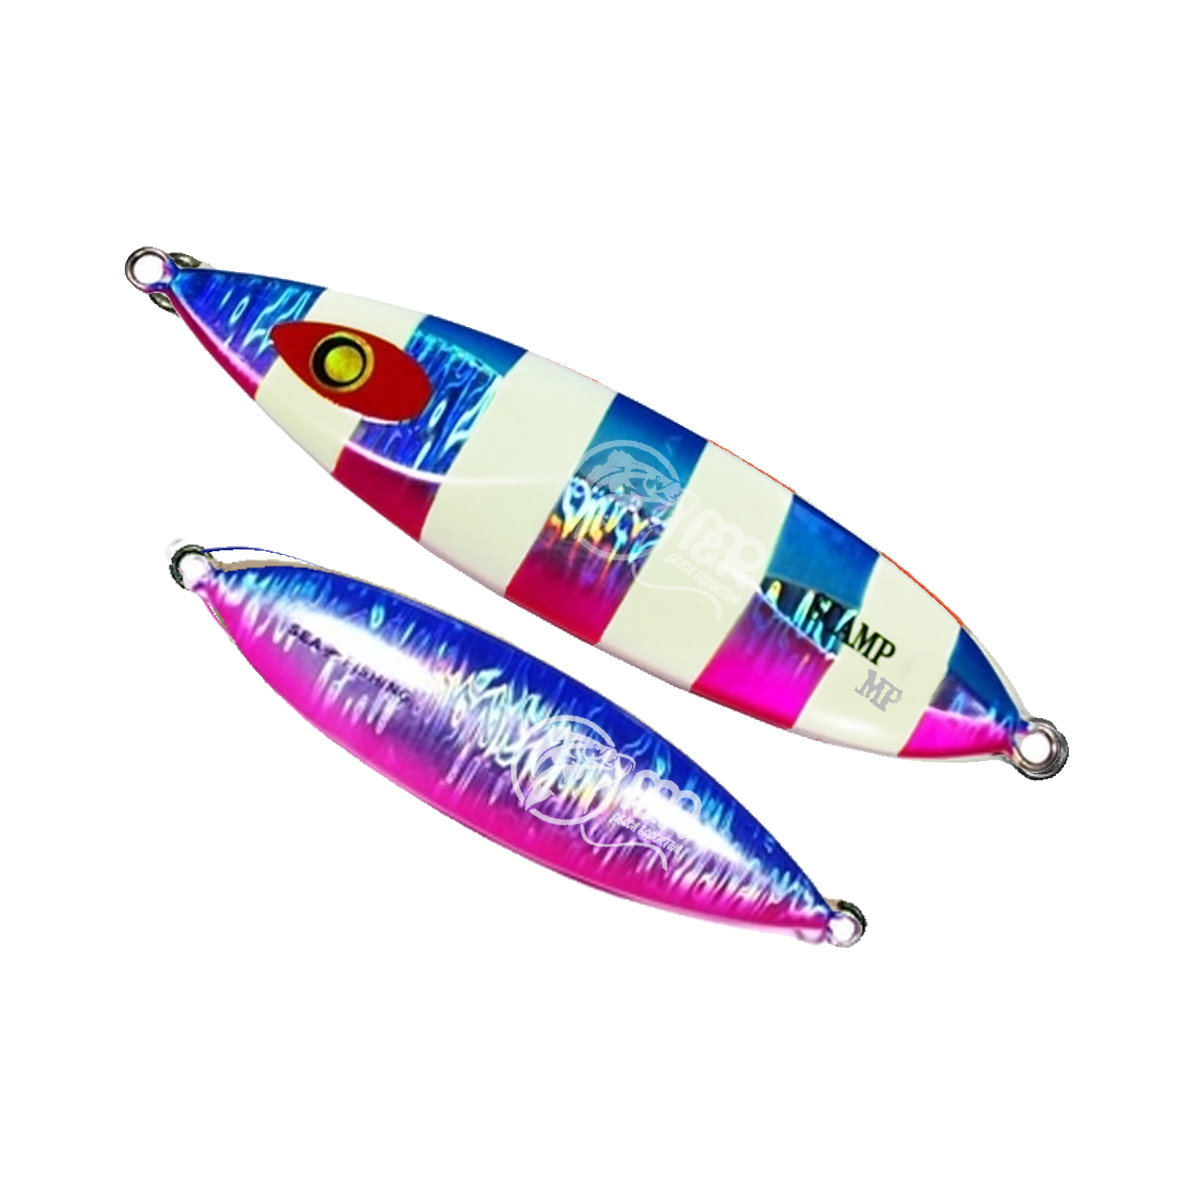 Isca Artificial Jig Scamp Slow Jigging 120g 11cm Sea Fishing